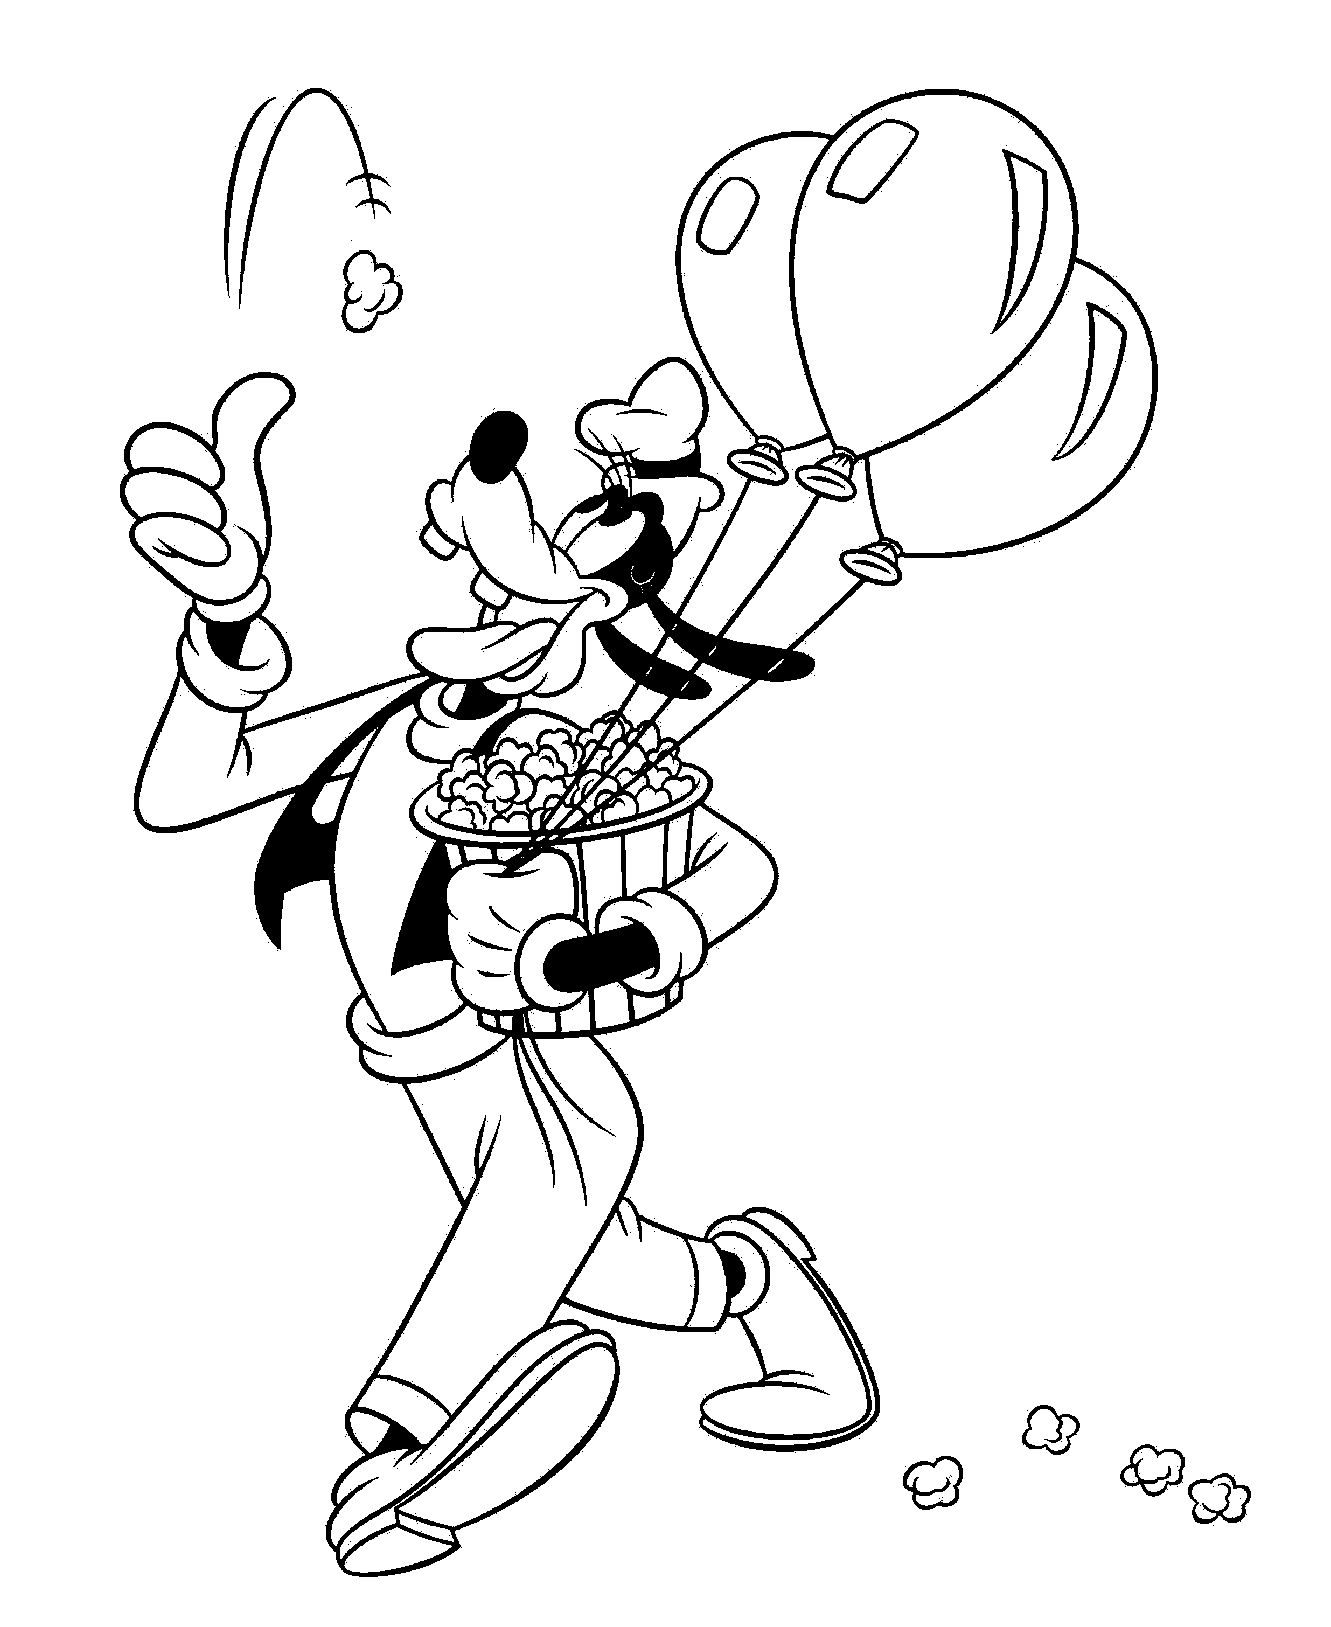 Goofy Run And Play Ball